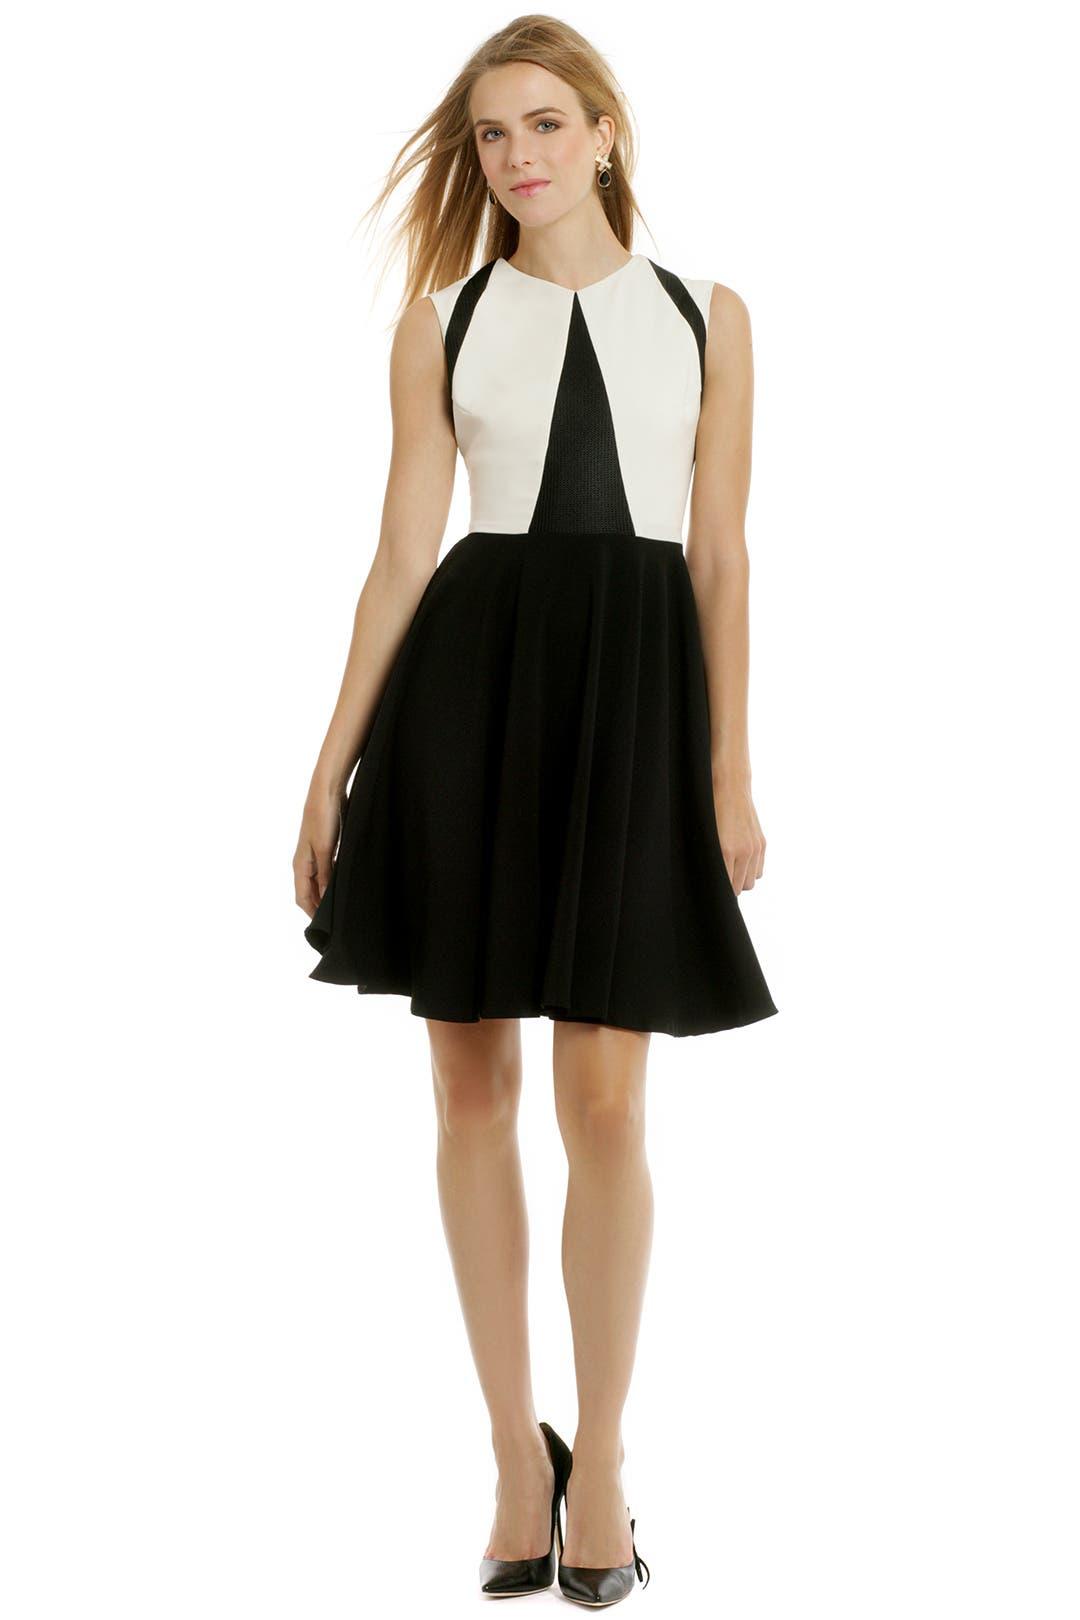 Domino Dress by Badgley Mischka